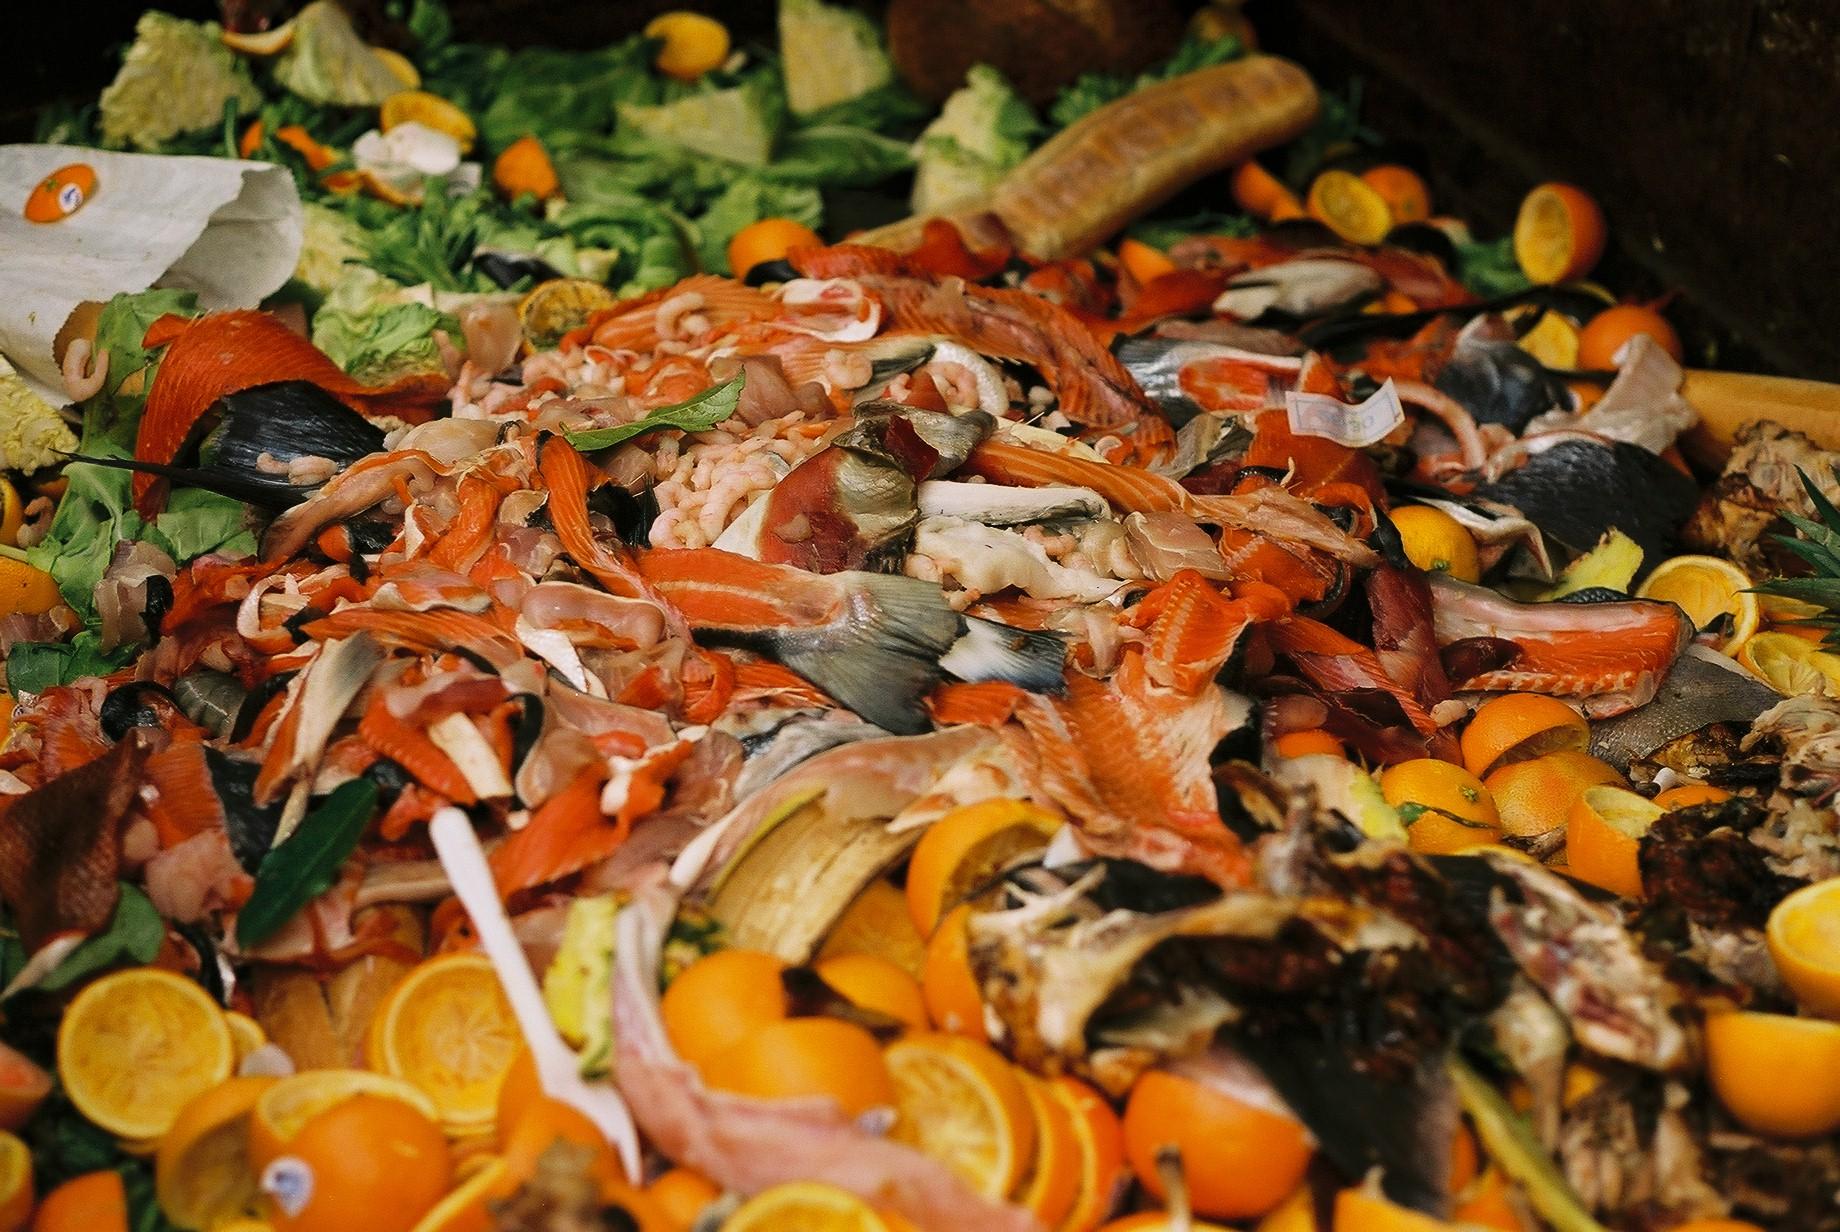 food waste - fsm